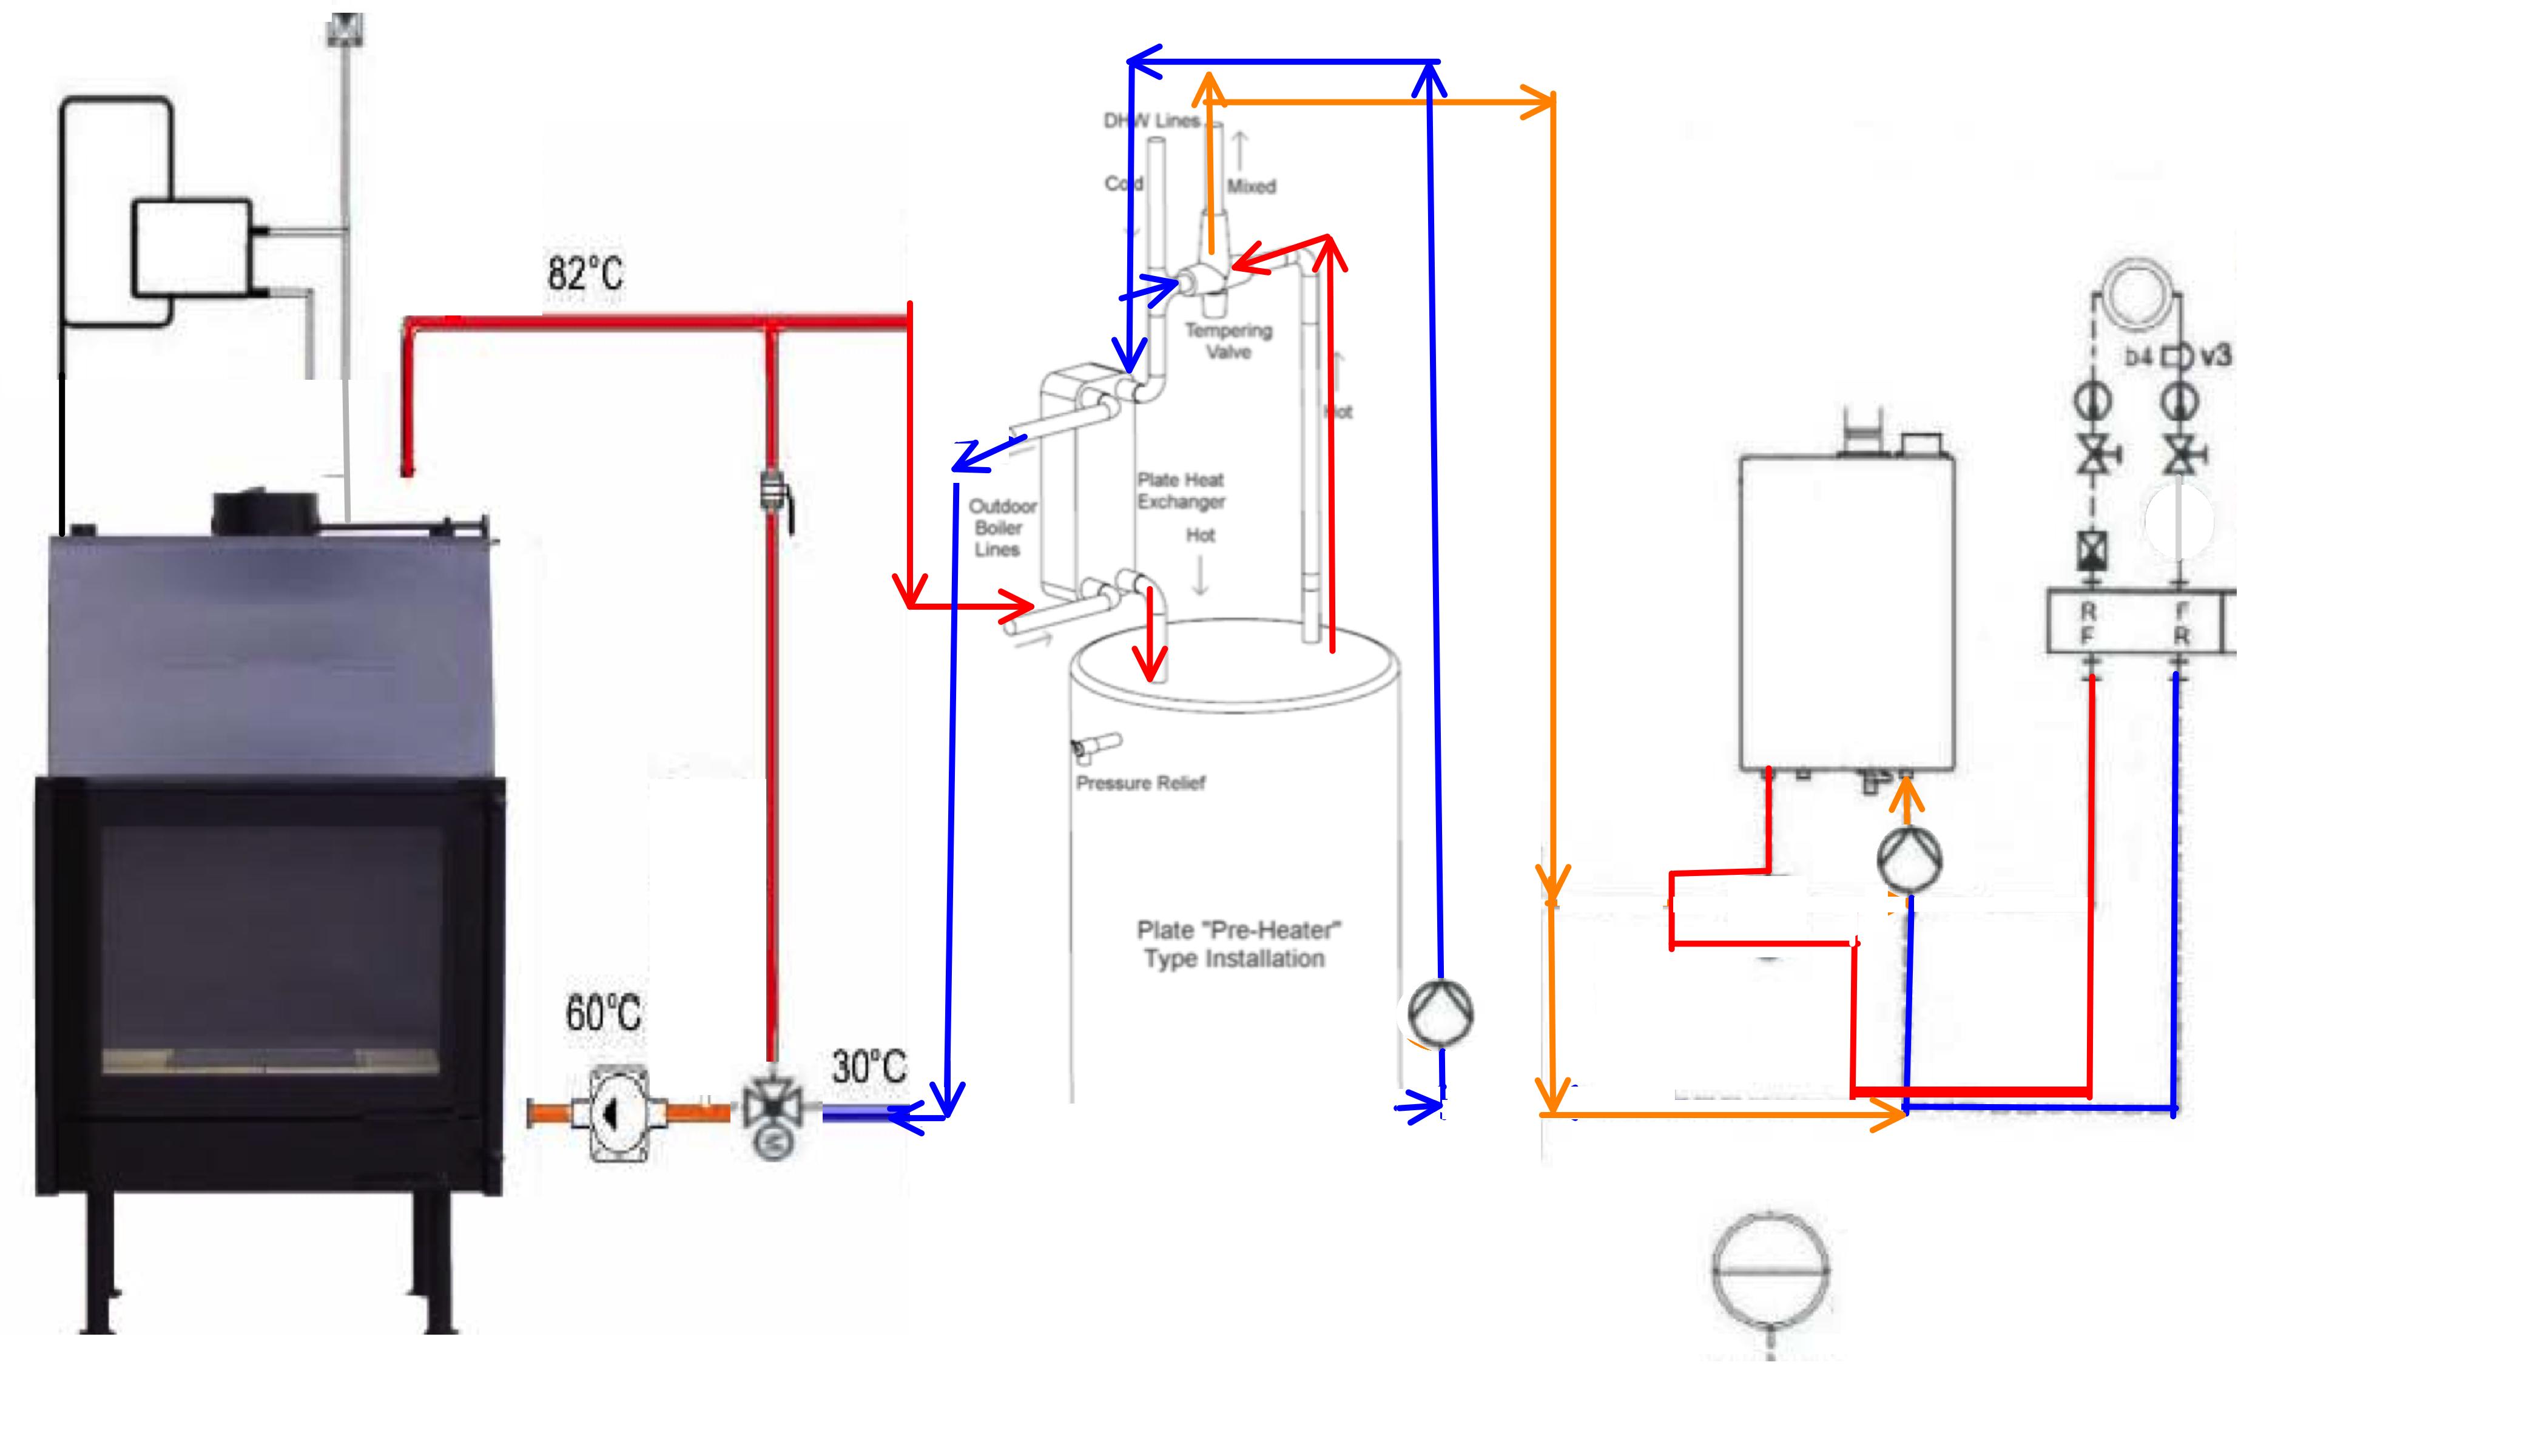 Wood Boiler Plumbing | Twinsprings Research Institute | Wood Furnace Schematic |  | Twinsprings Research Institute